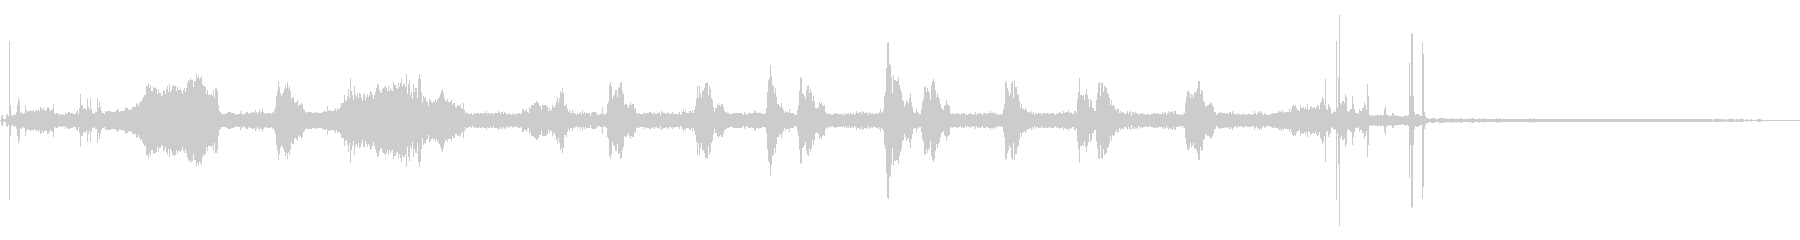 VHS:トップローディング:開始、...の未再生の波形